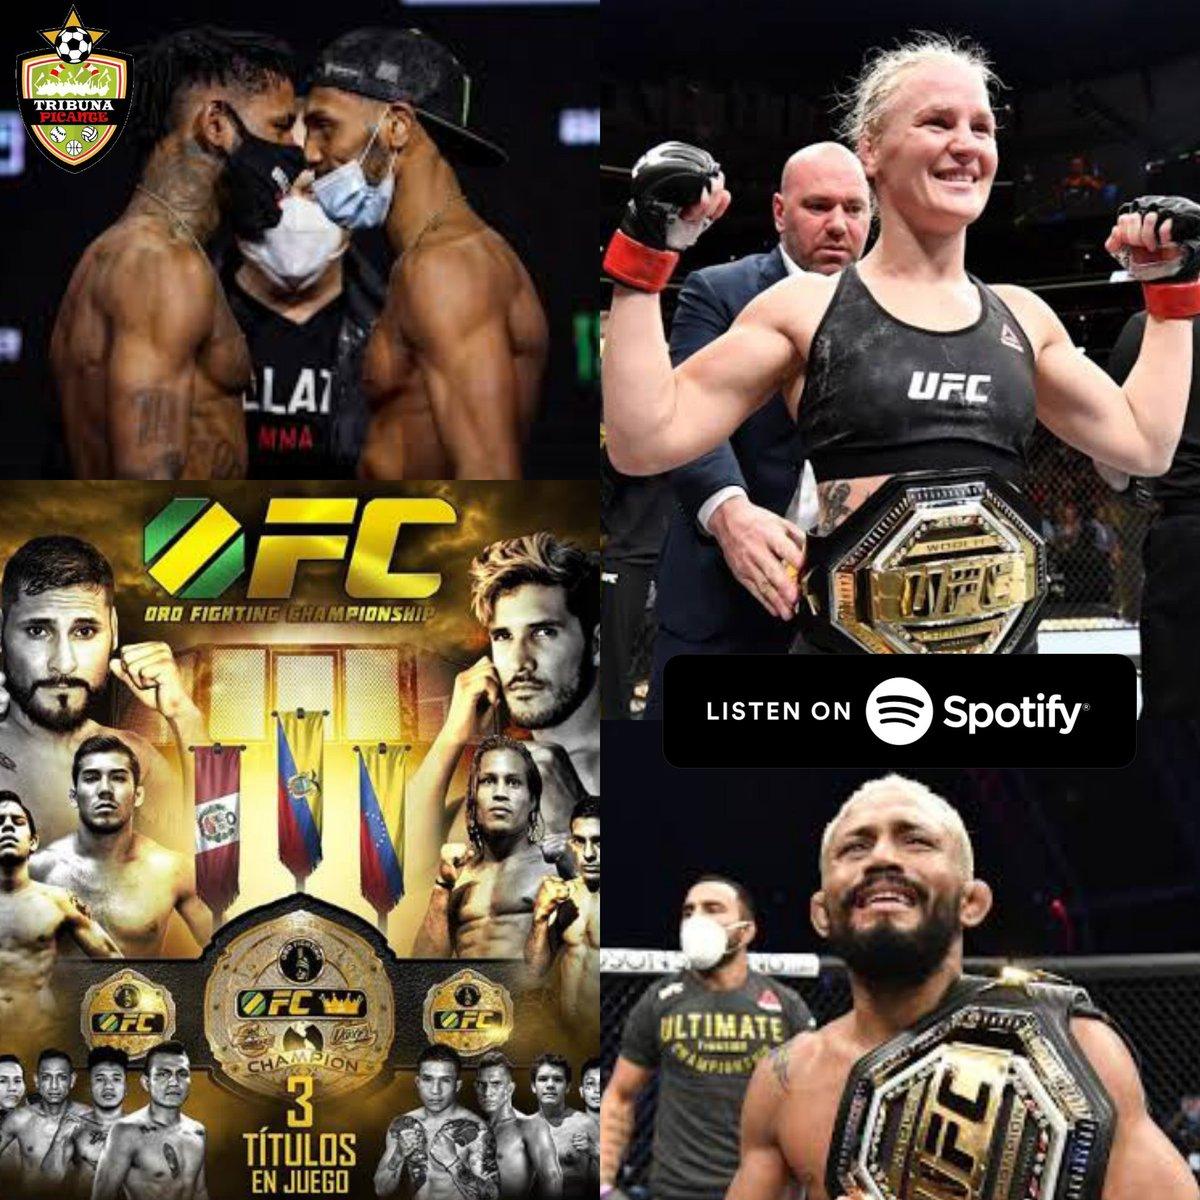 Ya esta disponible el #podcastpicante de #MMA en #TribunaPicante   https://t.co/JlPqa2brFH  https://t.co/dh0Xl3mtJX https://t.co/Yql0AK2YKP